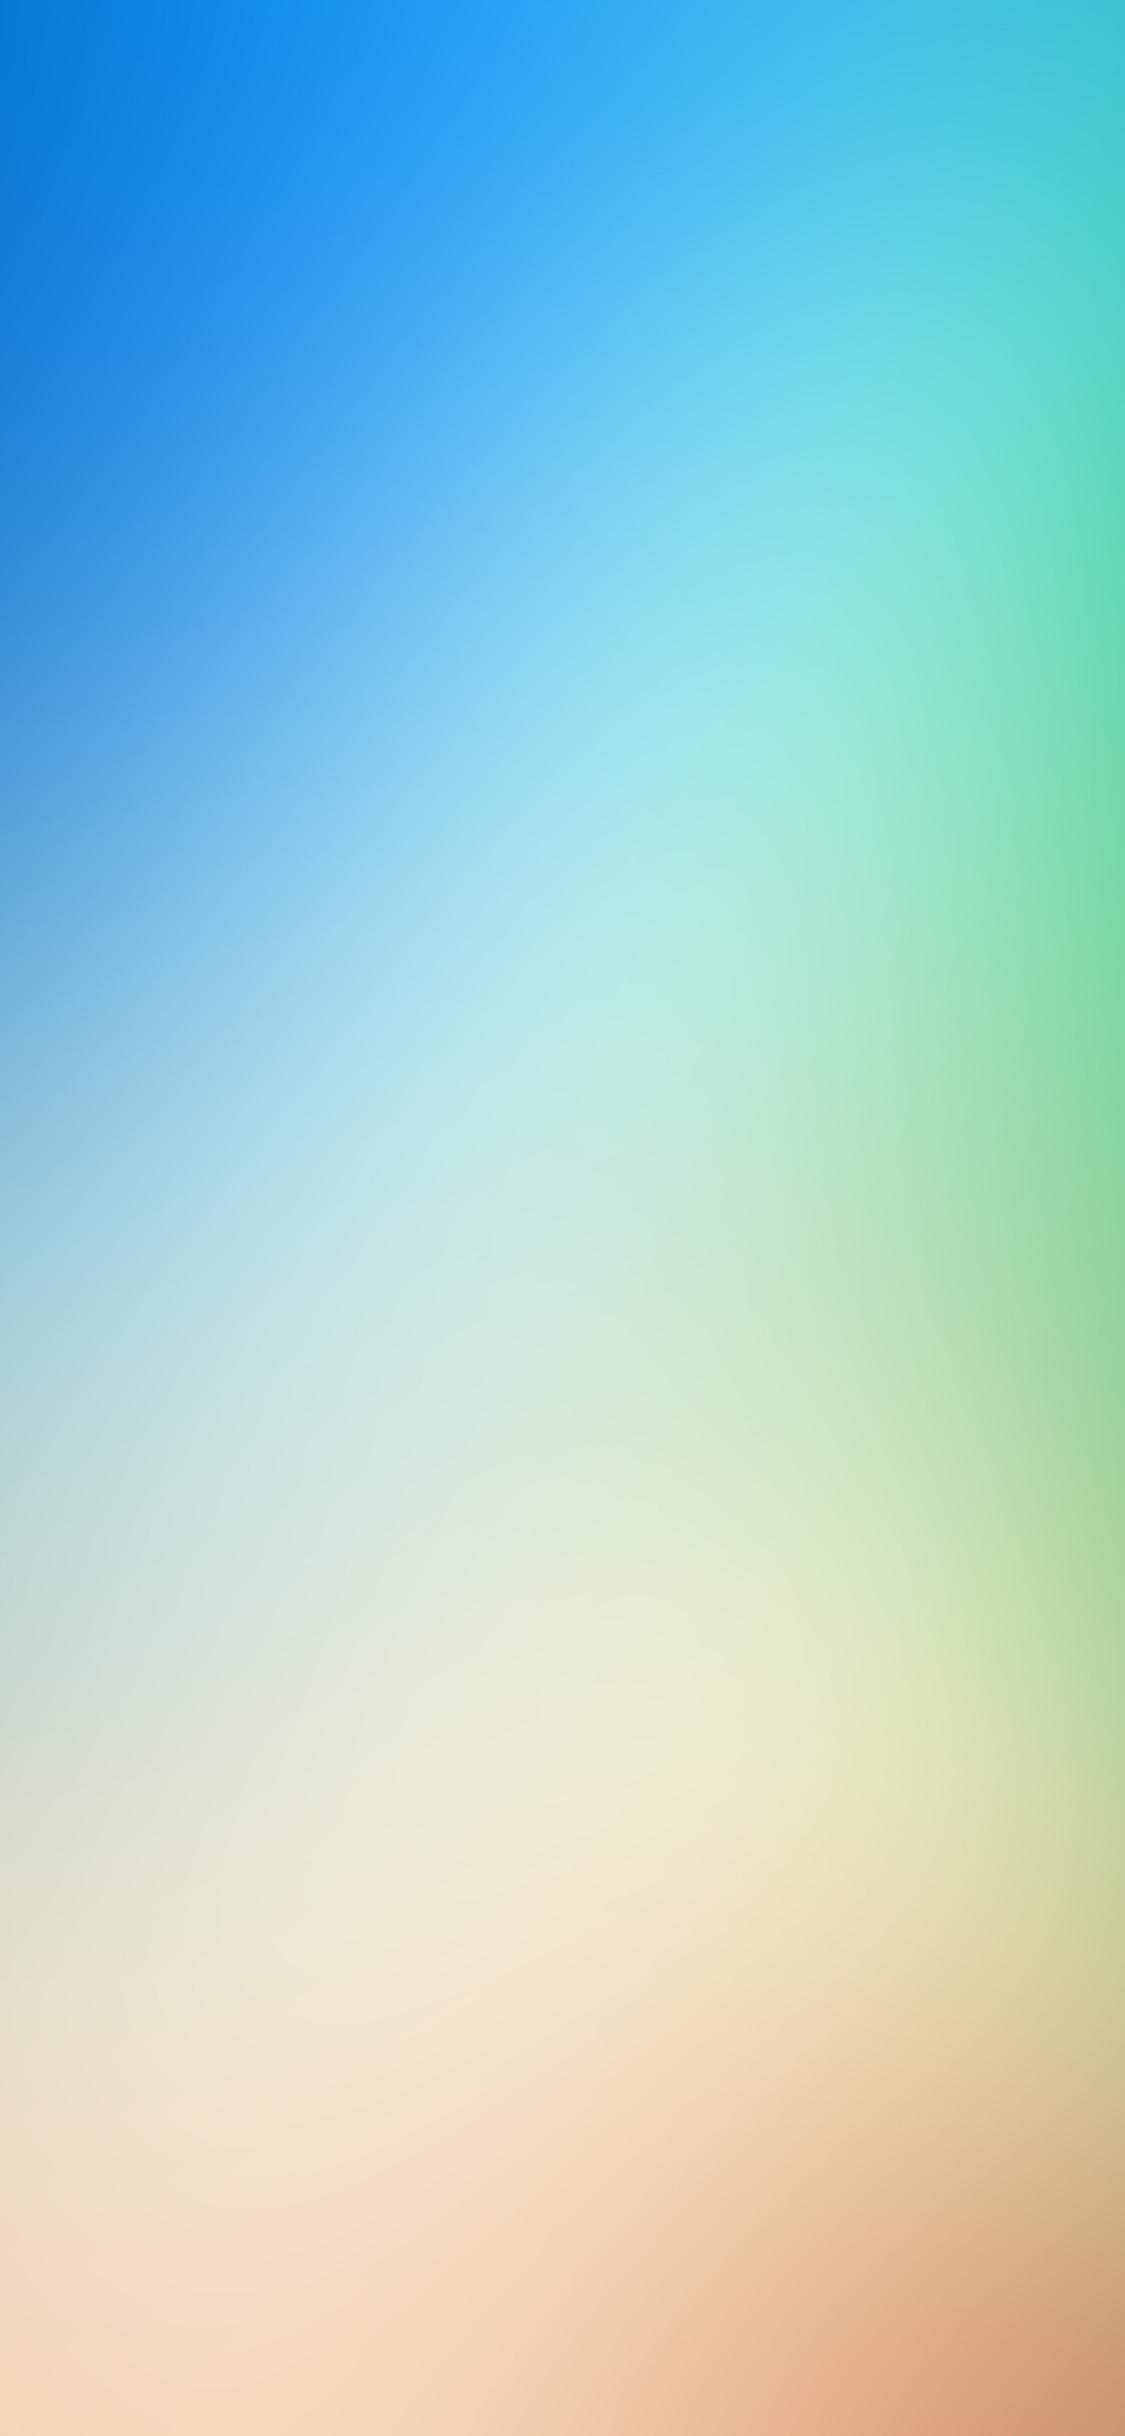 iPhoneXpapers.com-Apple-iPhone-wallpaper-sg15-blue-green-soft-gradation-blur